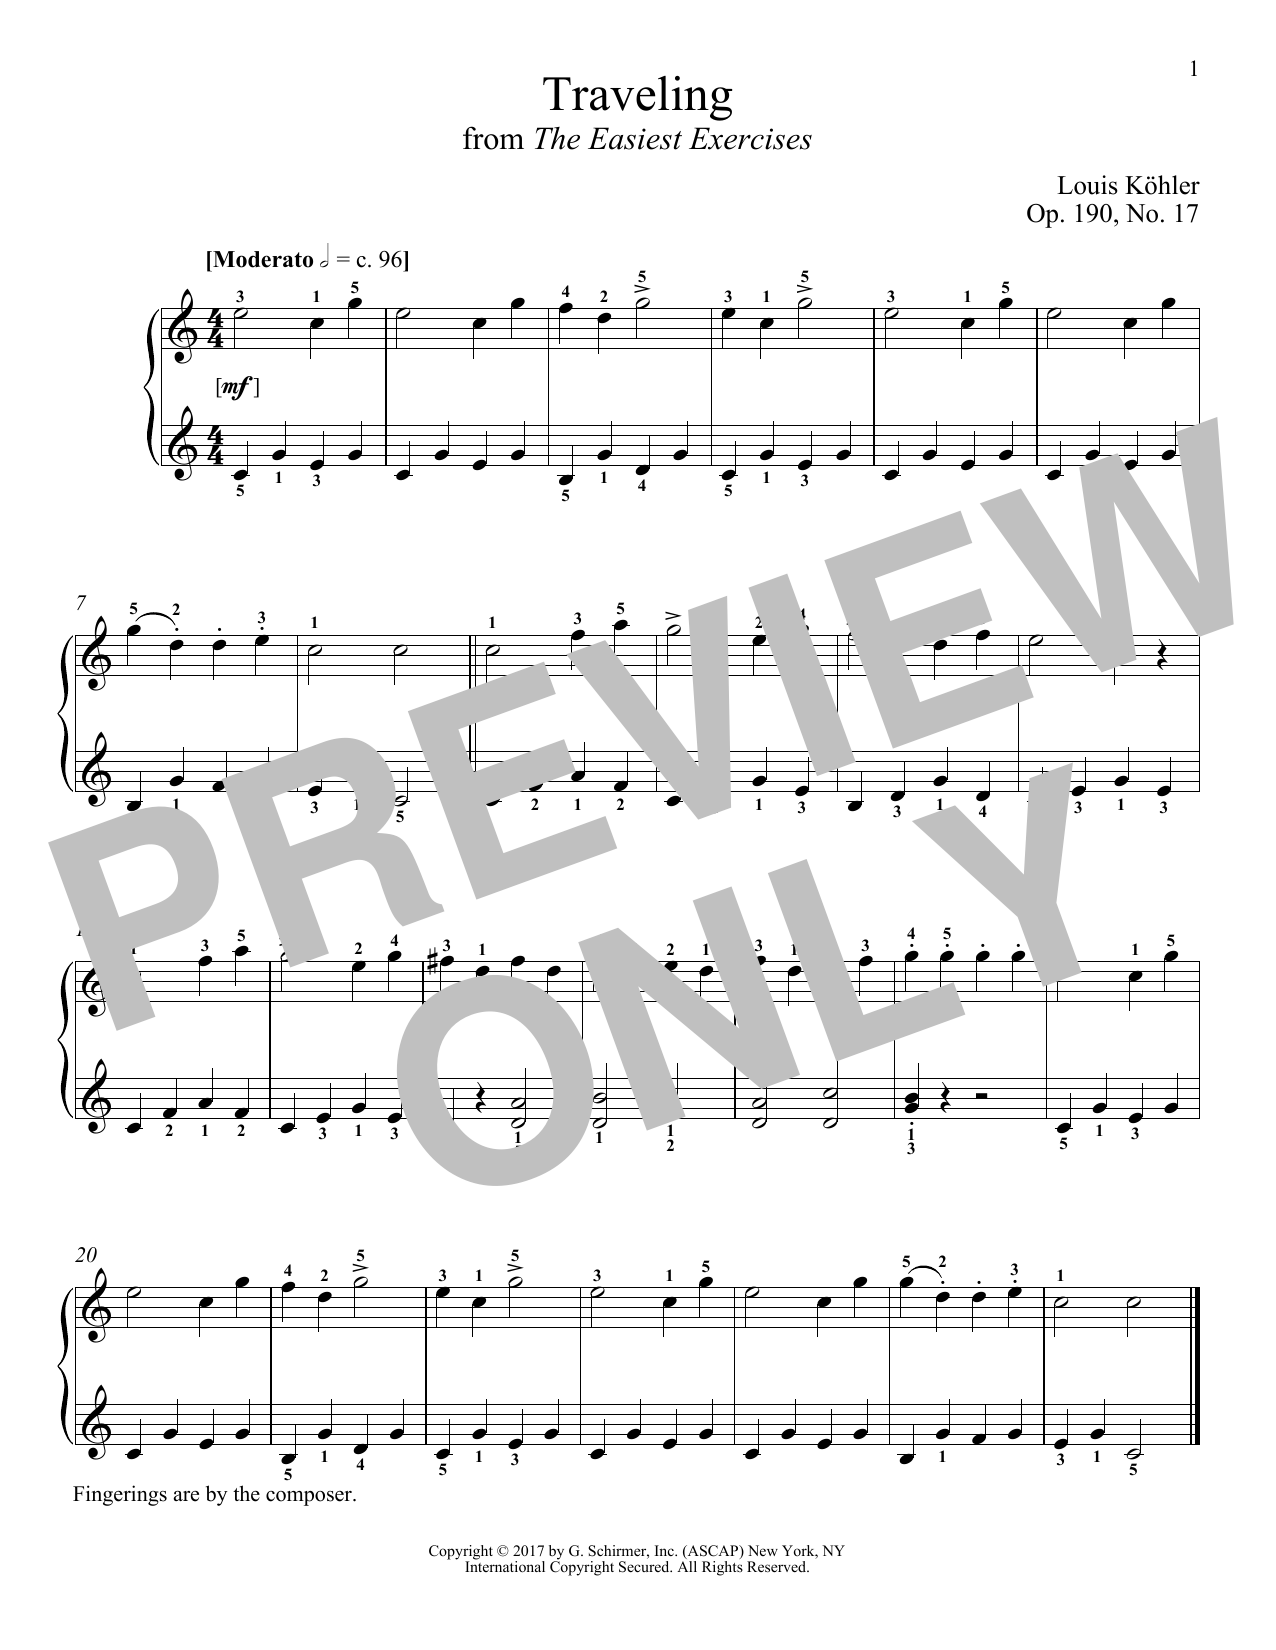 Louis Kohler Traveling, Op. 190, No. 17 sheet music notes and chords